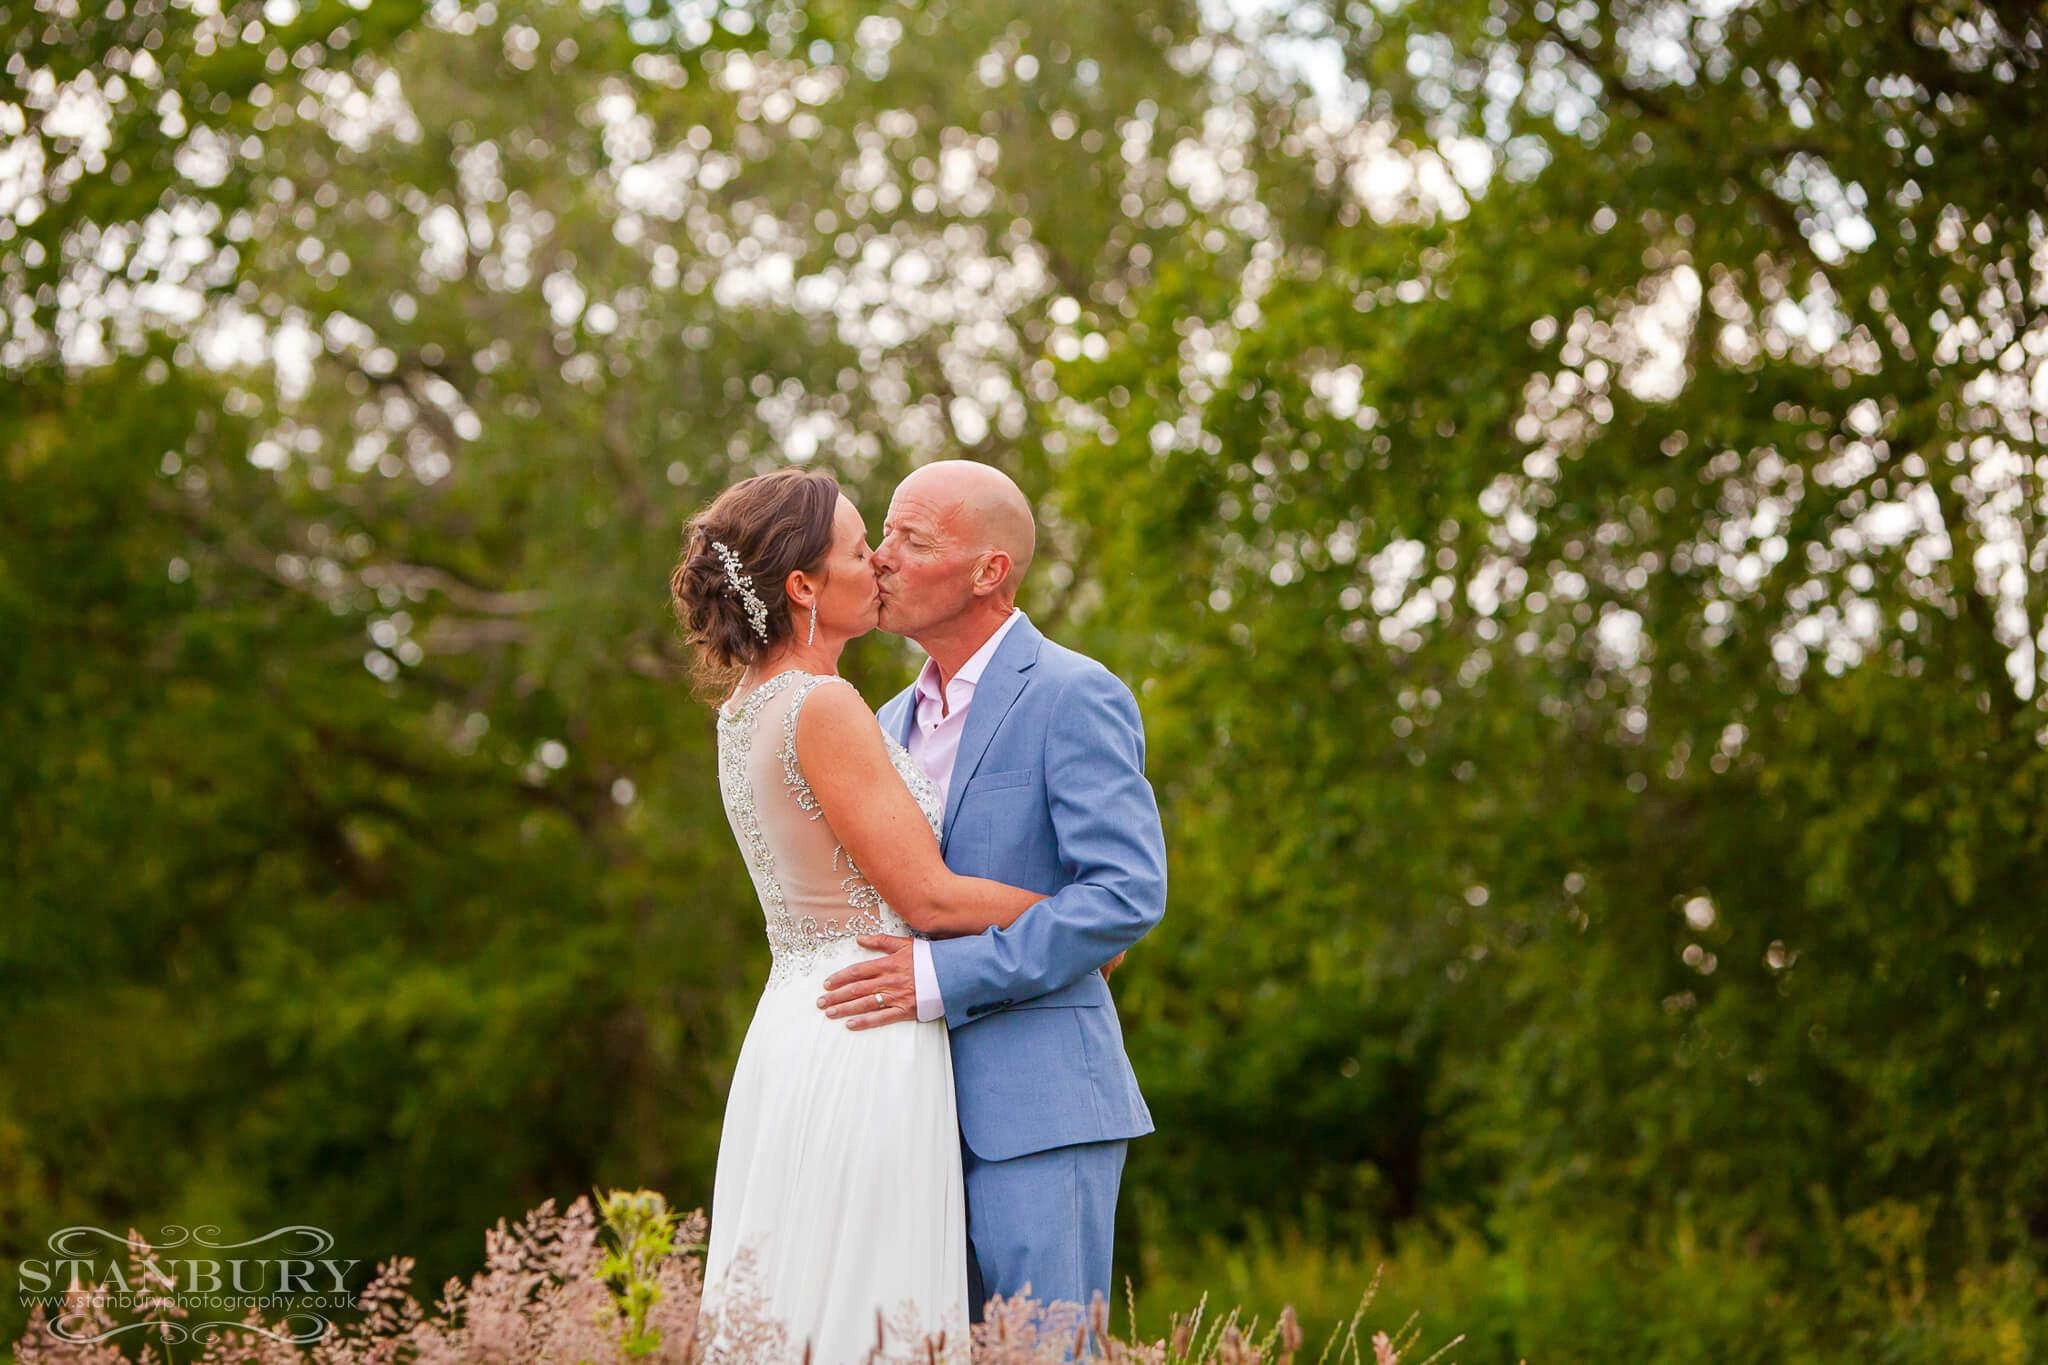 tipi-festival-bride-groom-wedding-photography-lancashire-stanbury-001